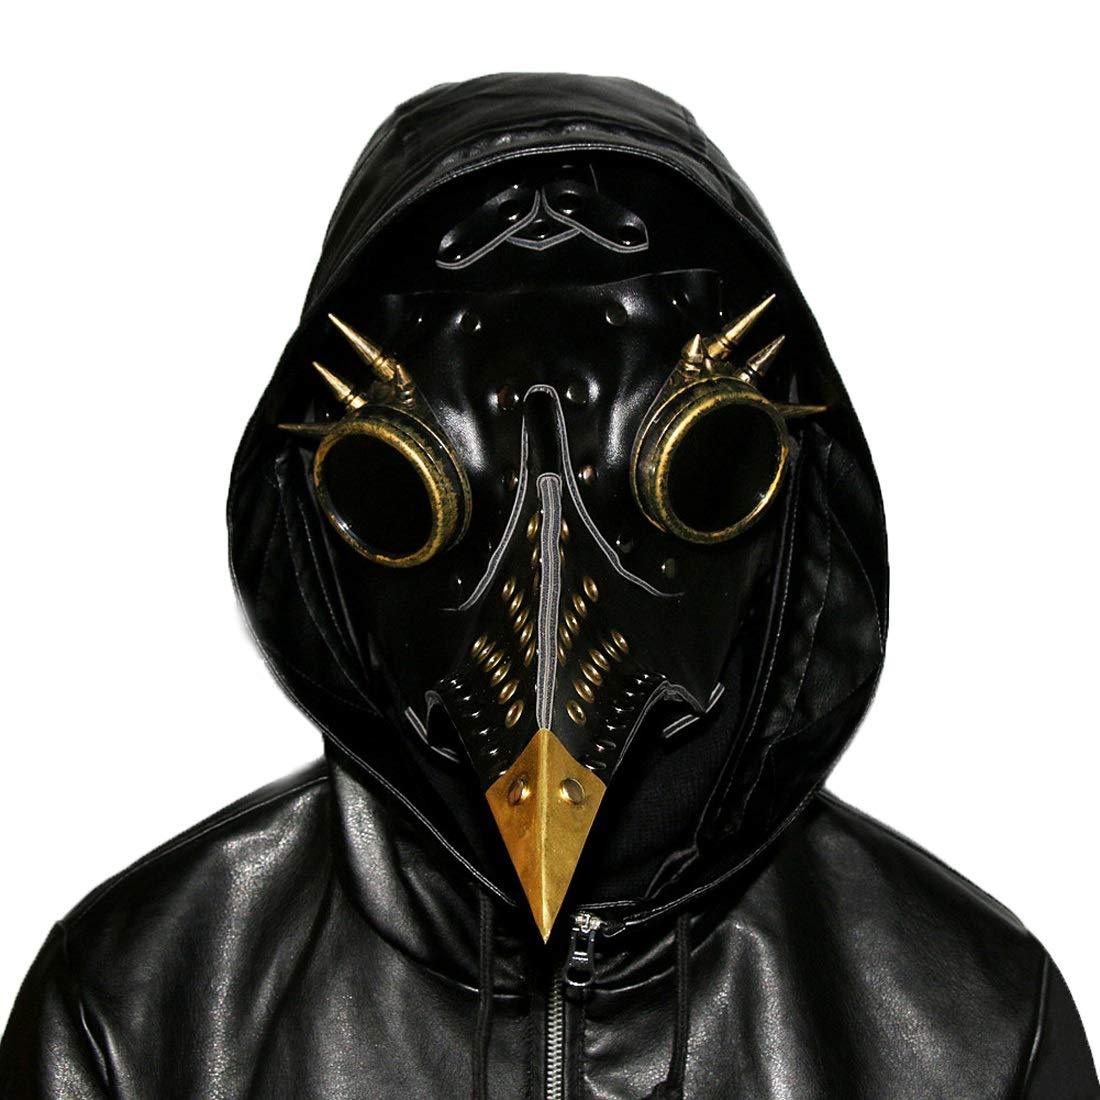 KERVINFENDRIYUN YY4 Vintage Rivet Naso Lungo Maschera di Uccello Becco Medievale Steampunk Halloween Party Masquerade Costume Puntelli 3 Colorei Disponibili